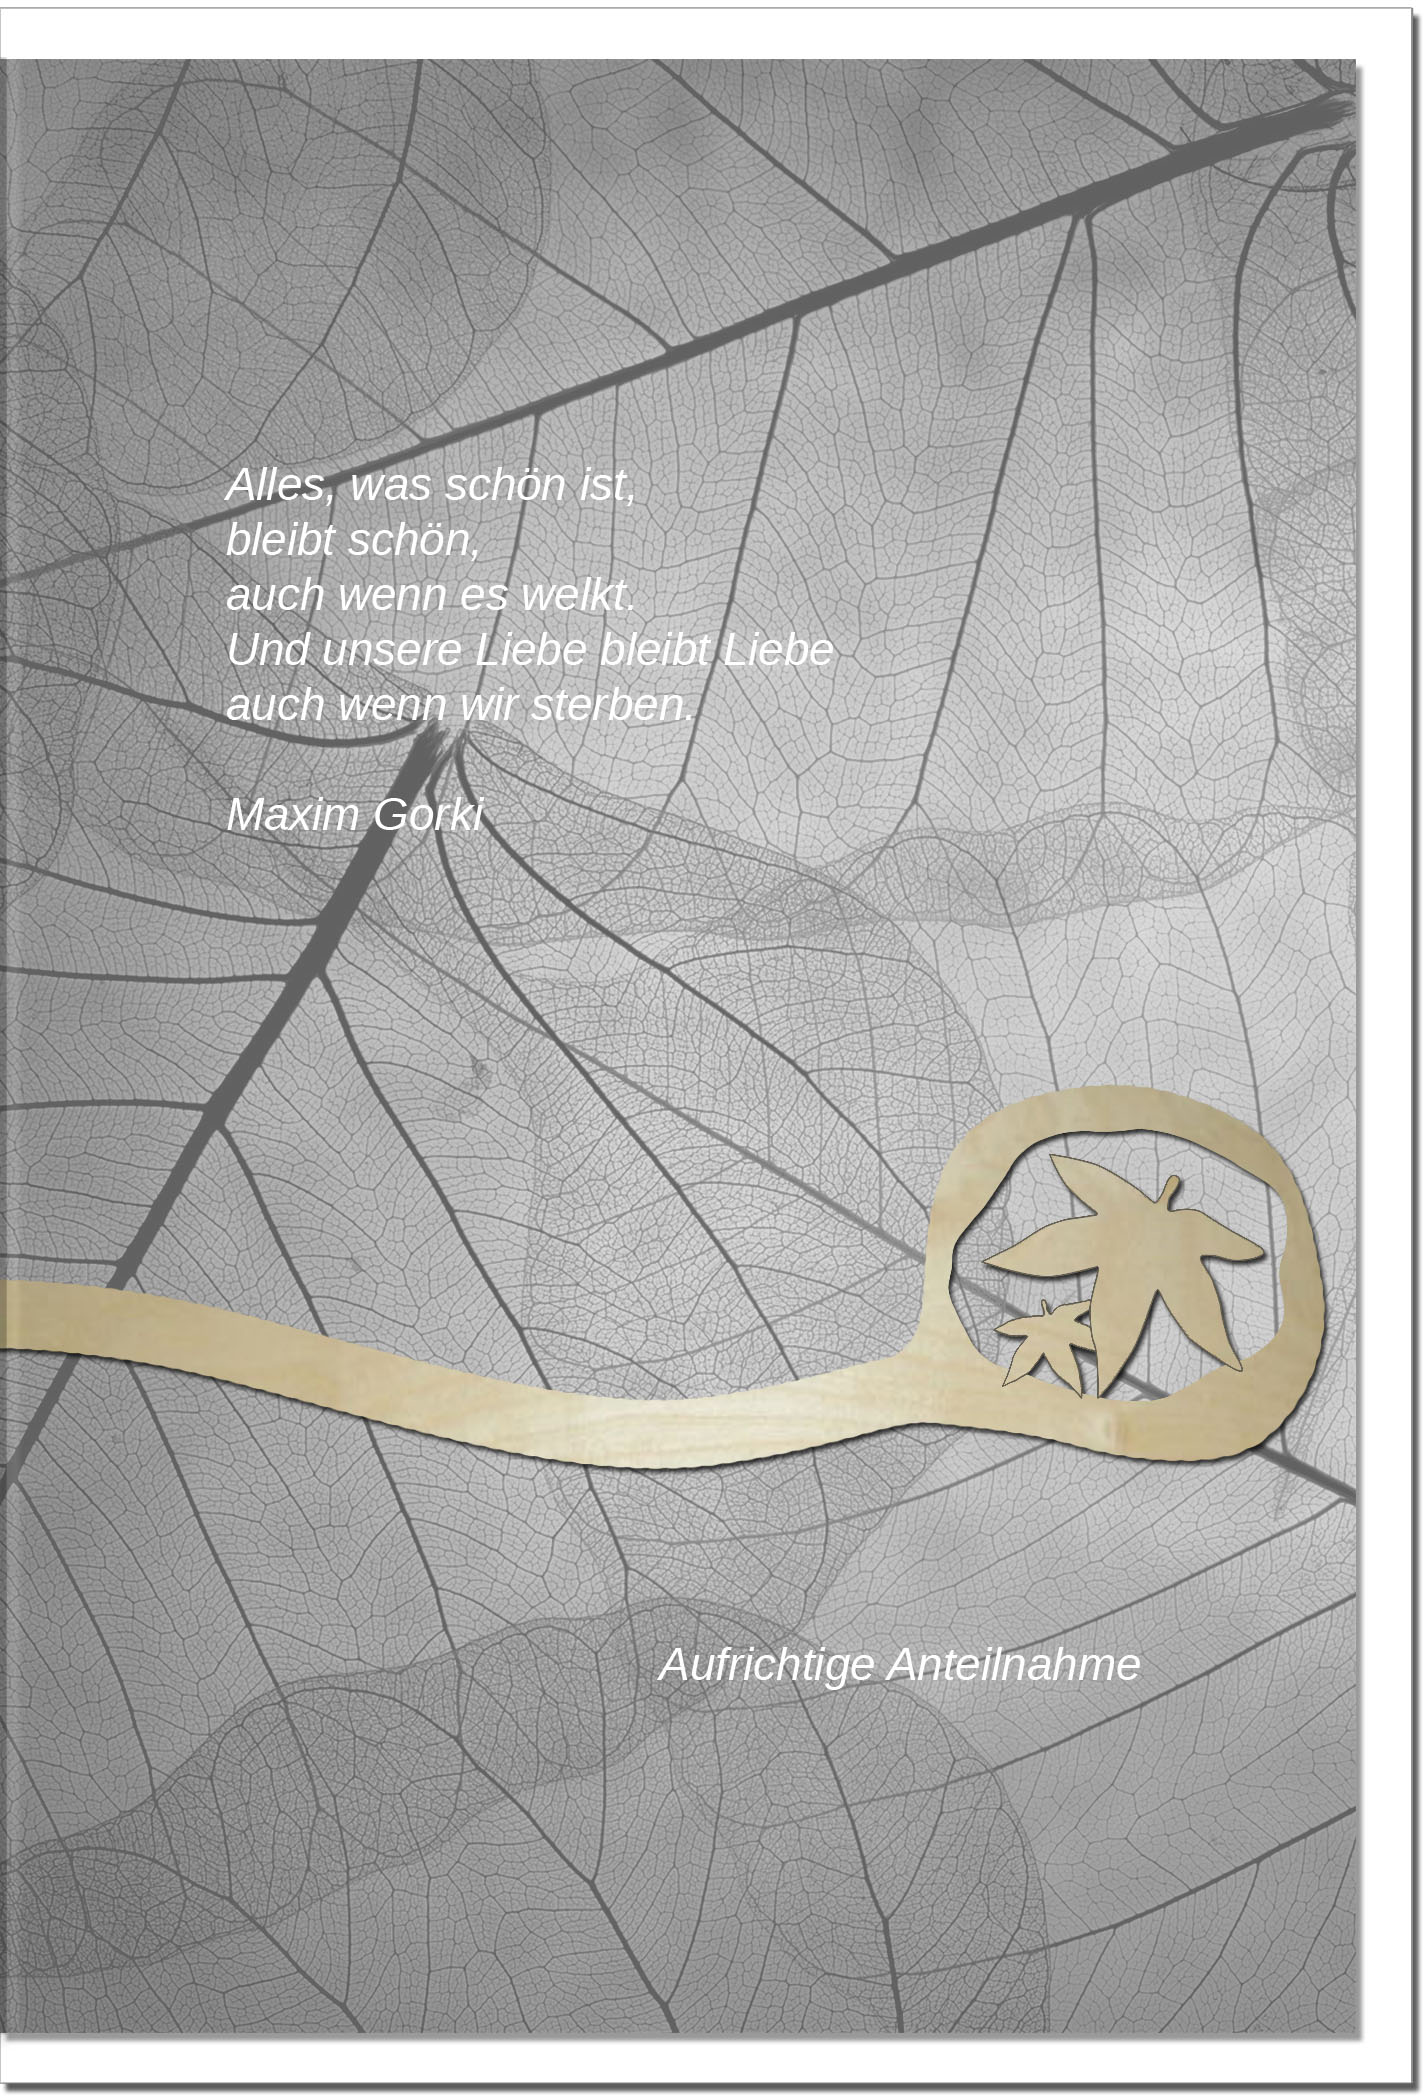 Kondolenzkarte DIE LIEBE BLEIBT | Herbstblatt | metALUm #00575